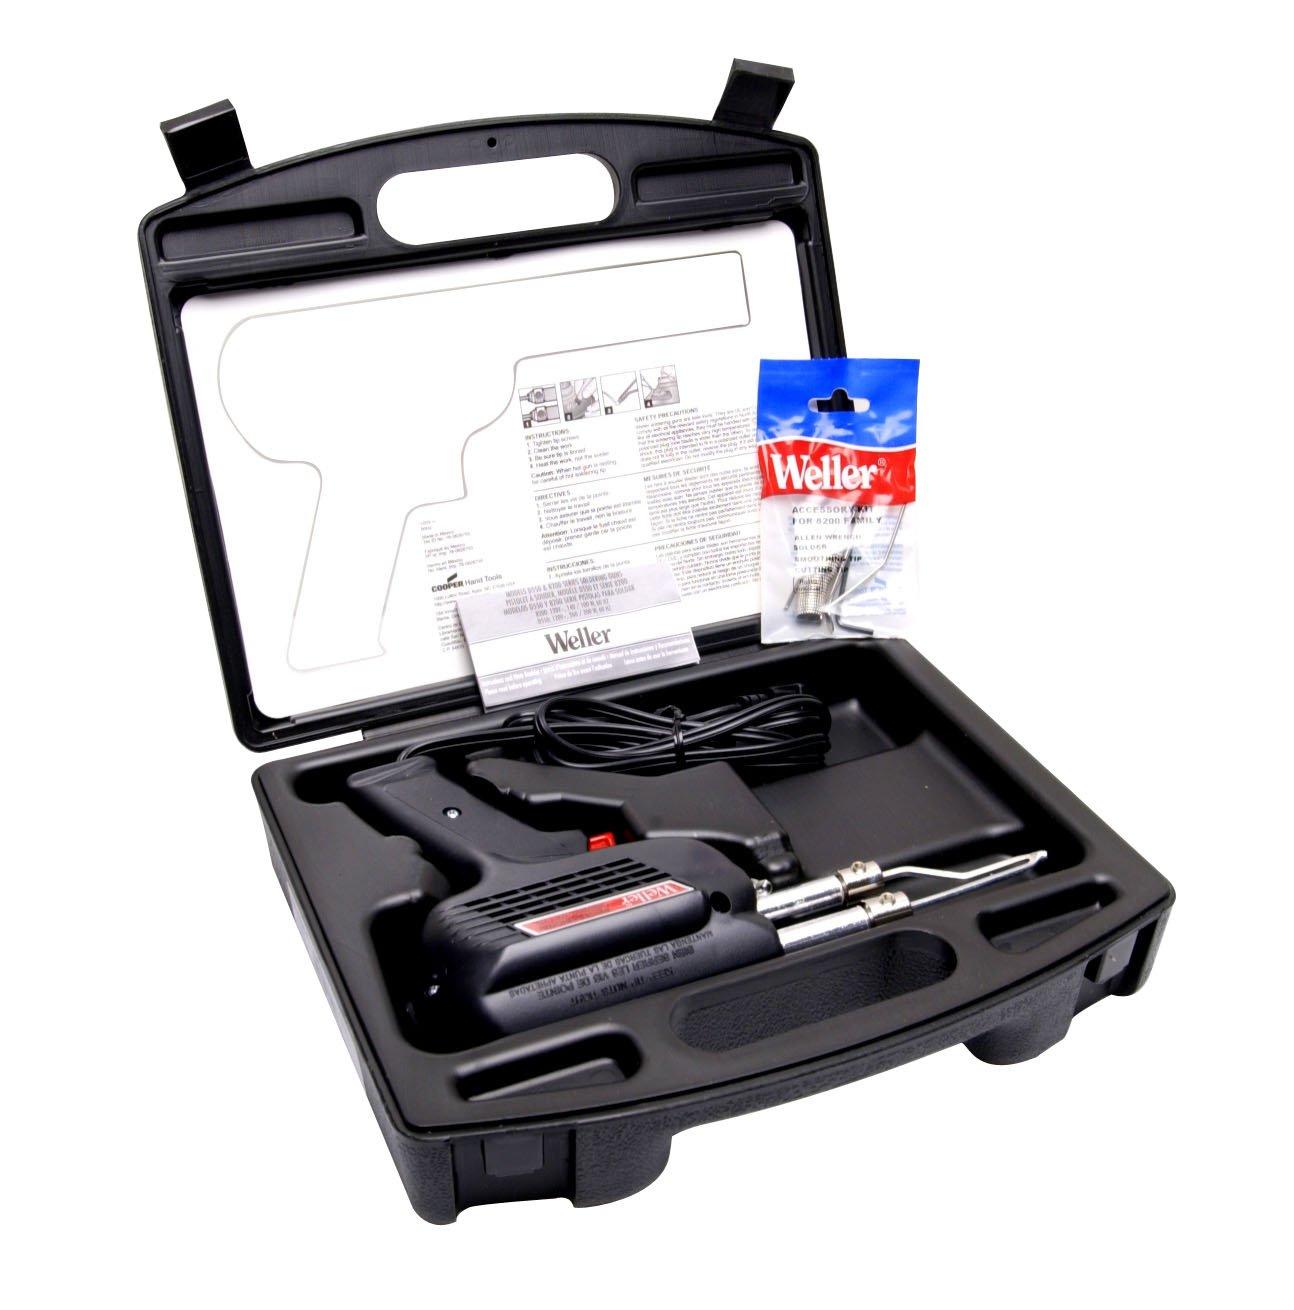 Weller D550PK 120-volt 260/200-watt Professional Soldering Gun Kit product image